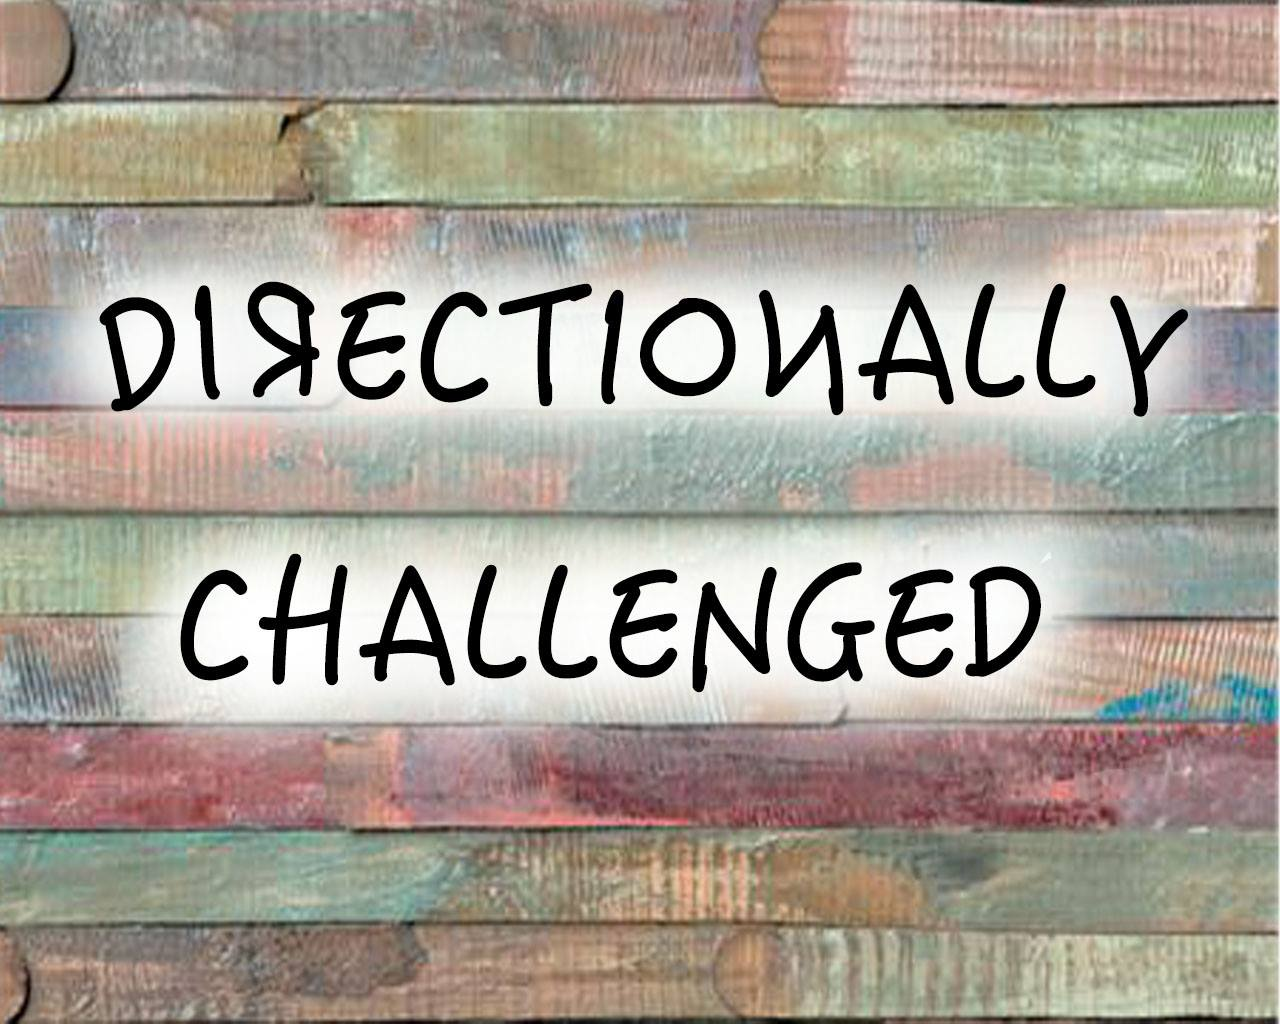 Directionally Challenged.jpg